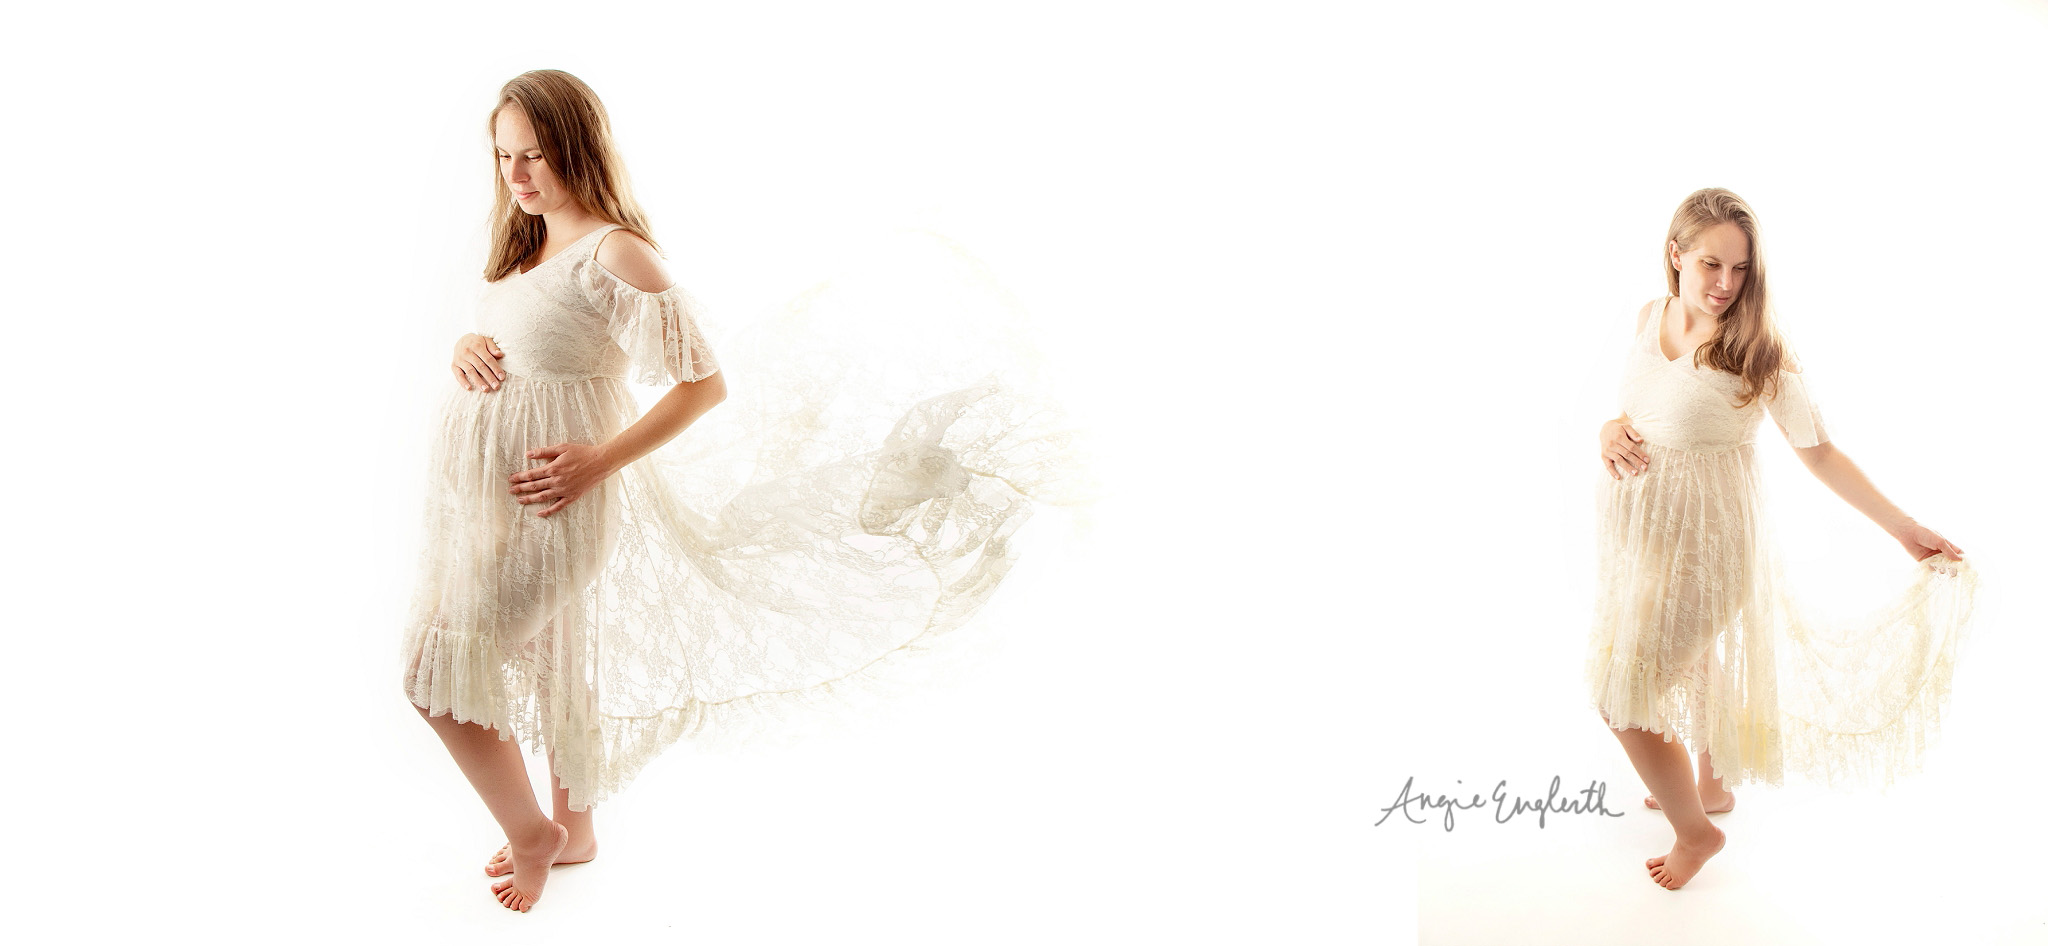 lancaster_maternity_photographer_angie_englerth_central_pa_b059.jpg